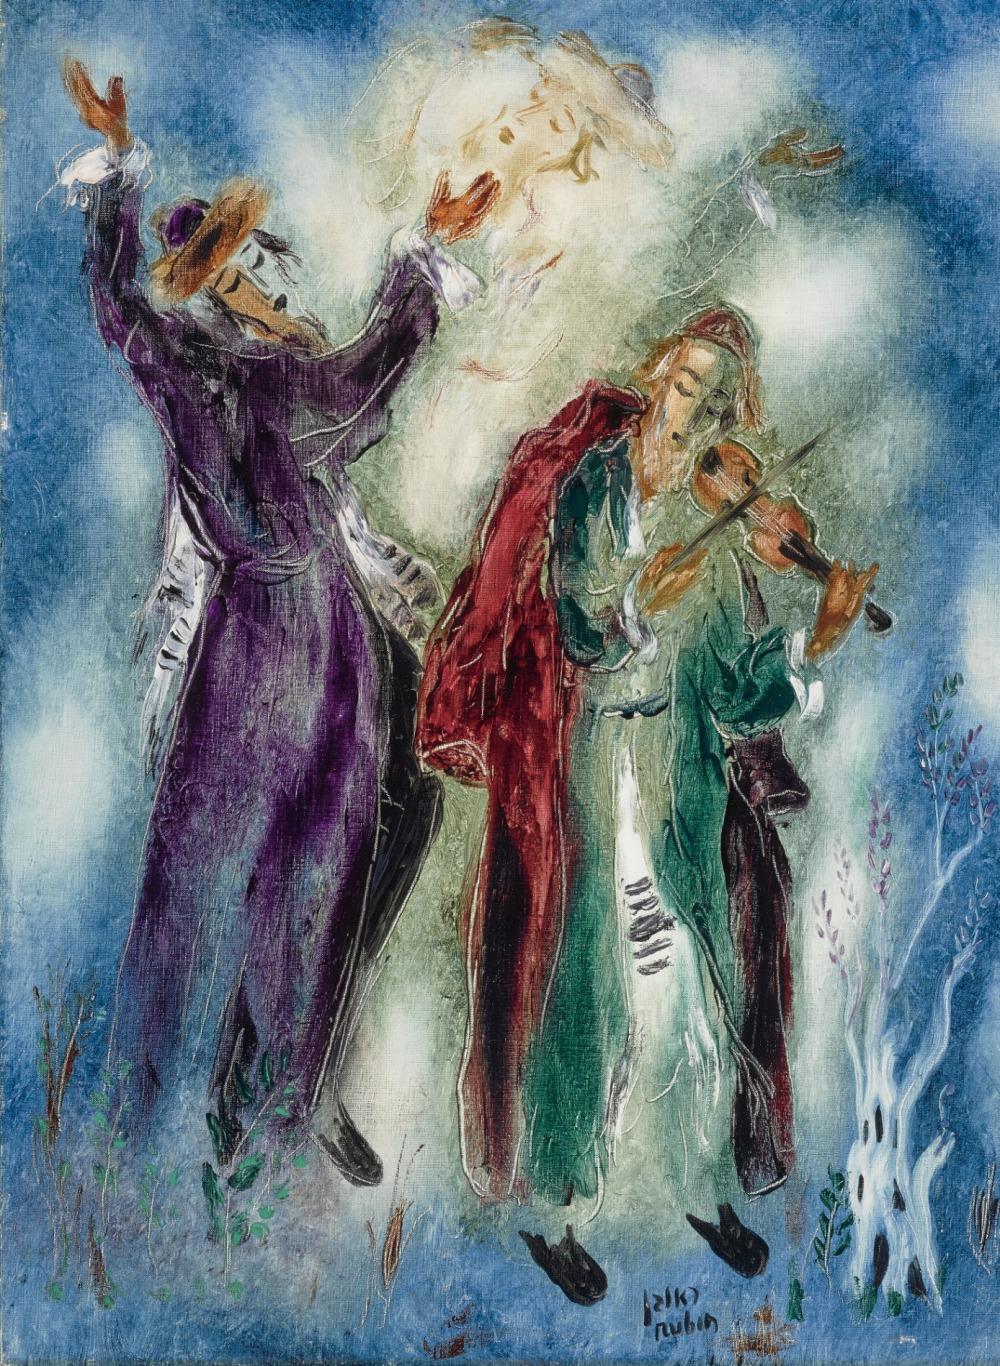 rubin, reuven chassidic dancers figures sotheby's n09638lot9mljlen